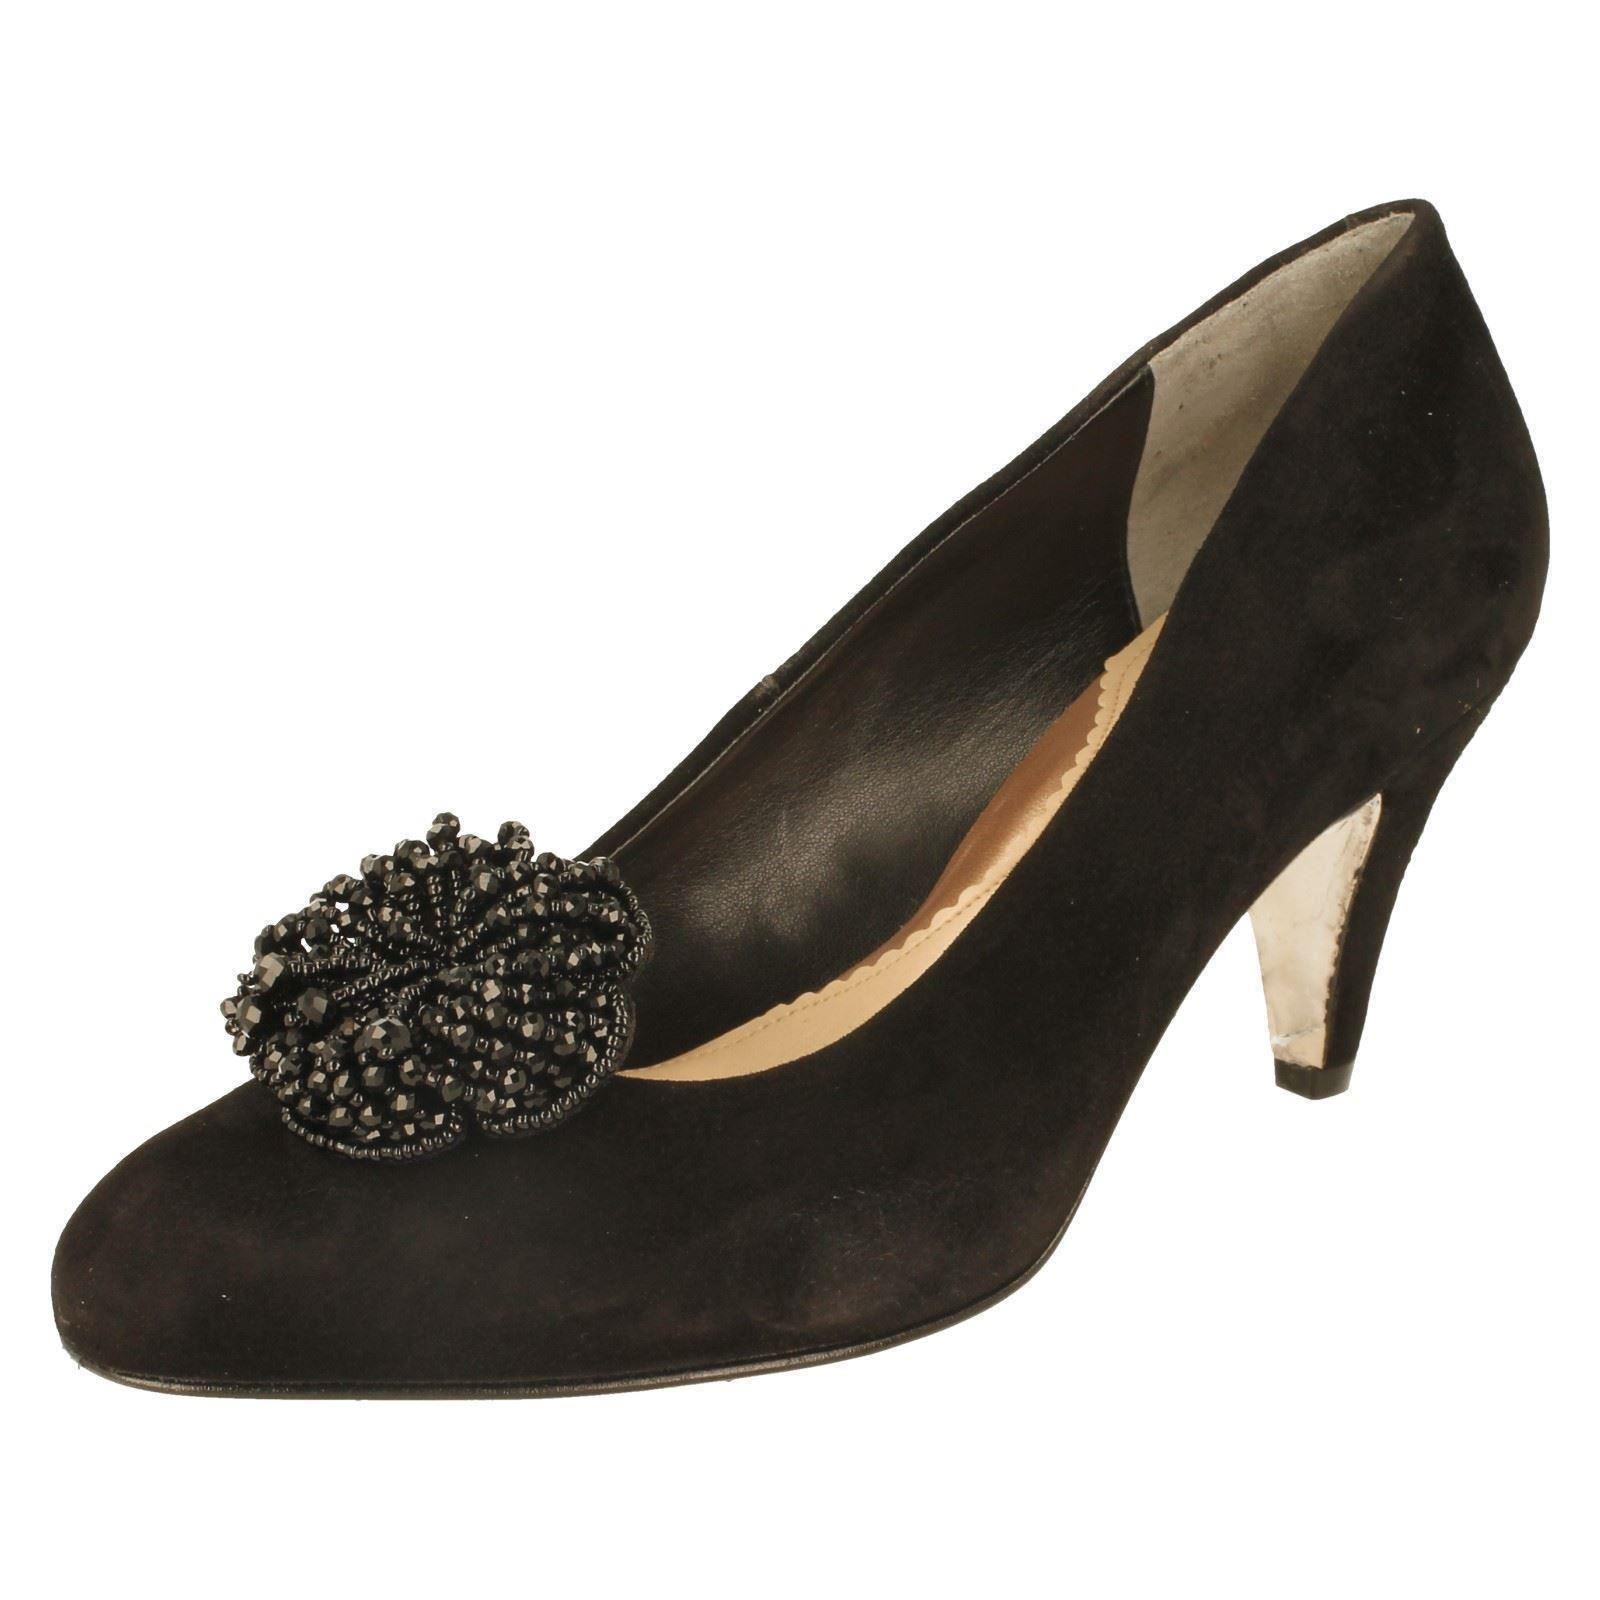 Ladies-Van-Dal-Court-Shoe-The-Style-Magdalen-W